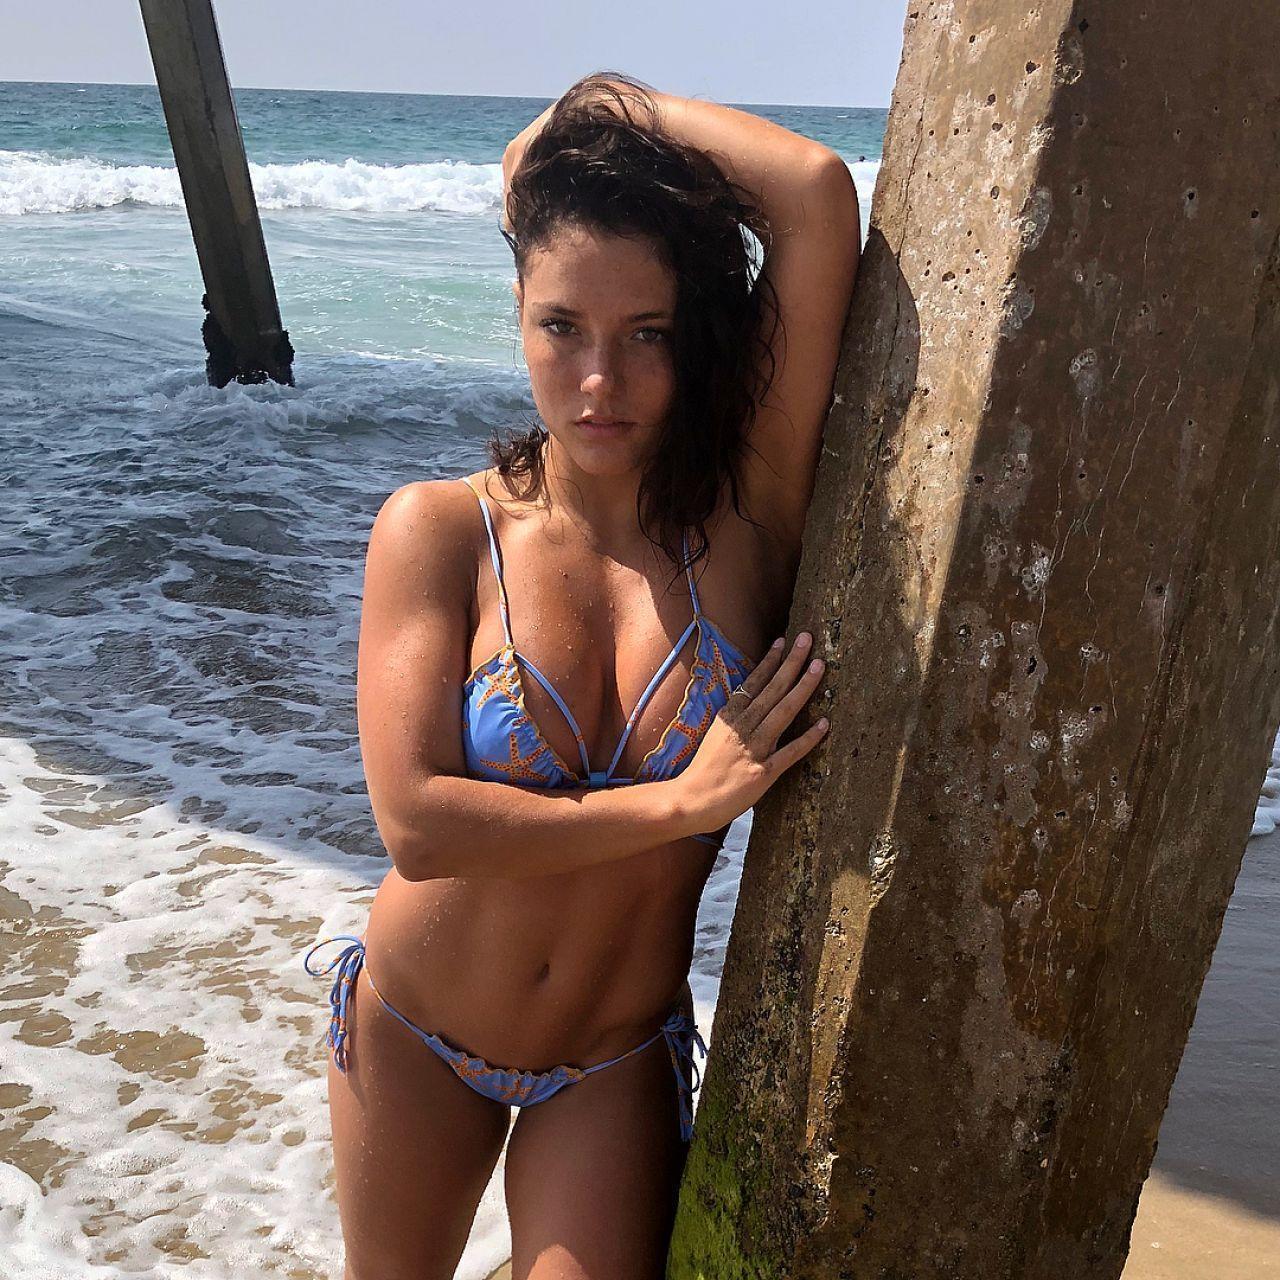 Jade Chynoweth bikini pics